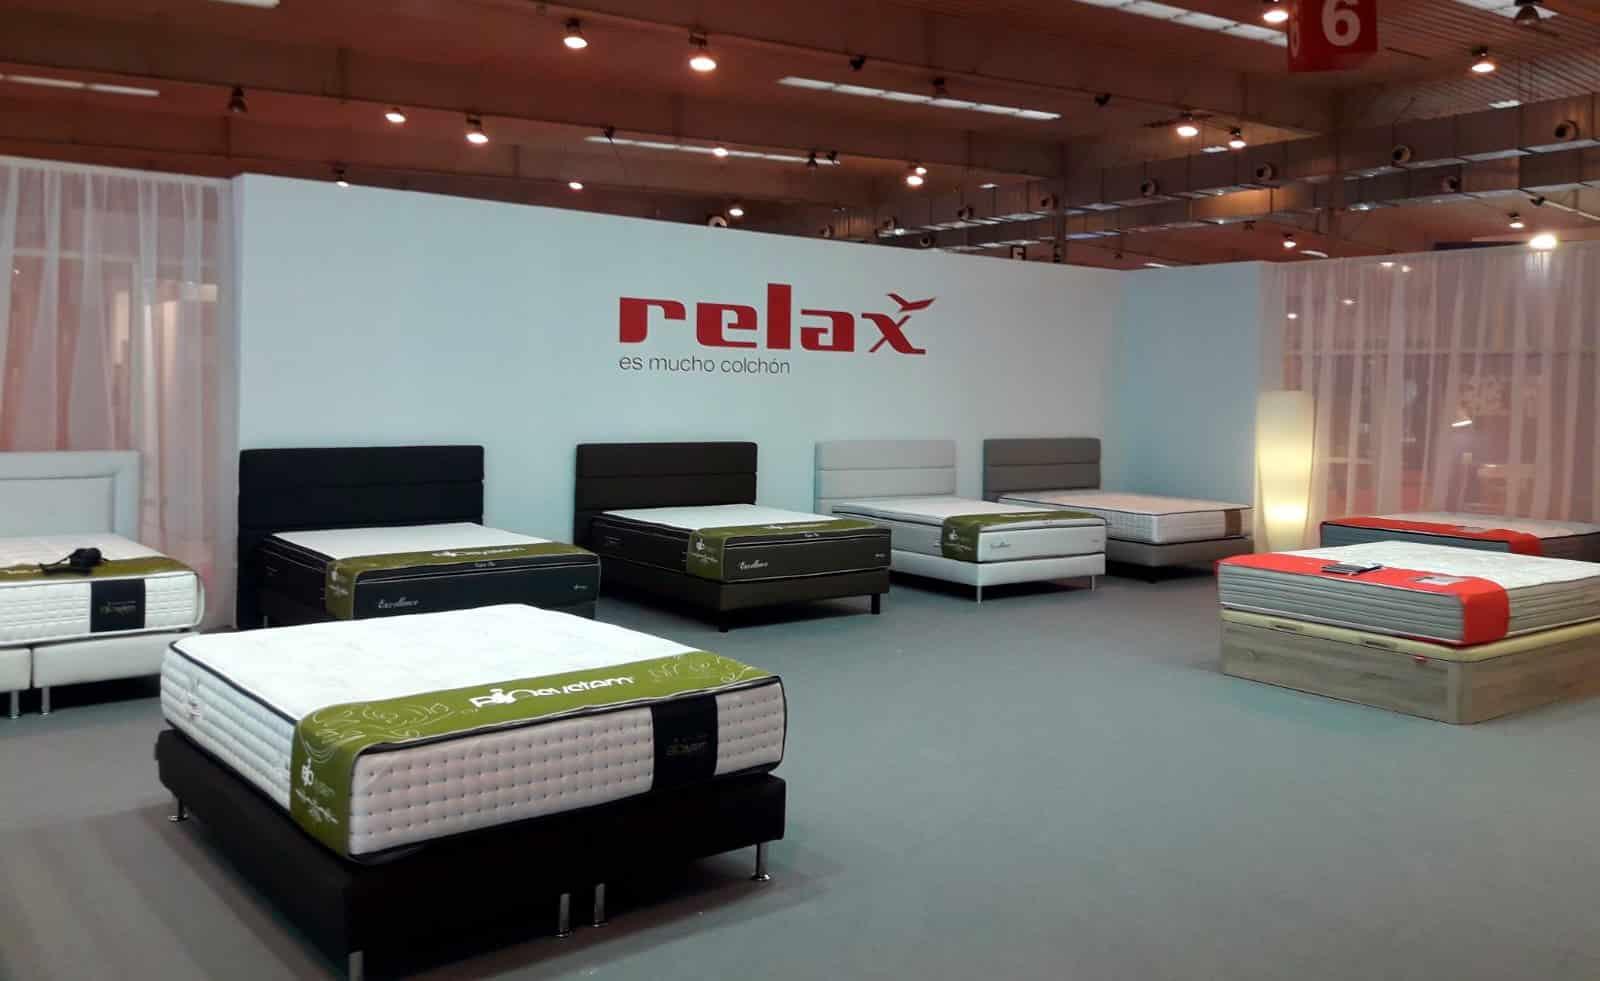 Nuevo Catálogo de Colchones Relax, ¡IM-PRE-SIO-NAN-TE!